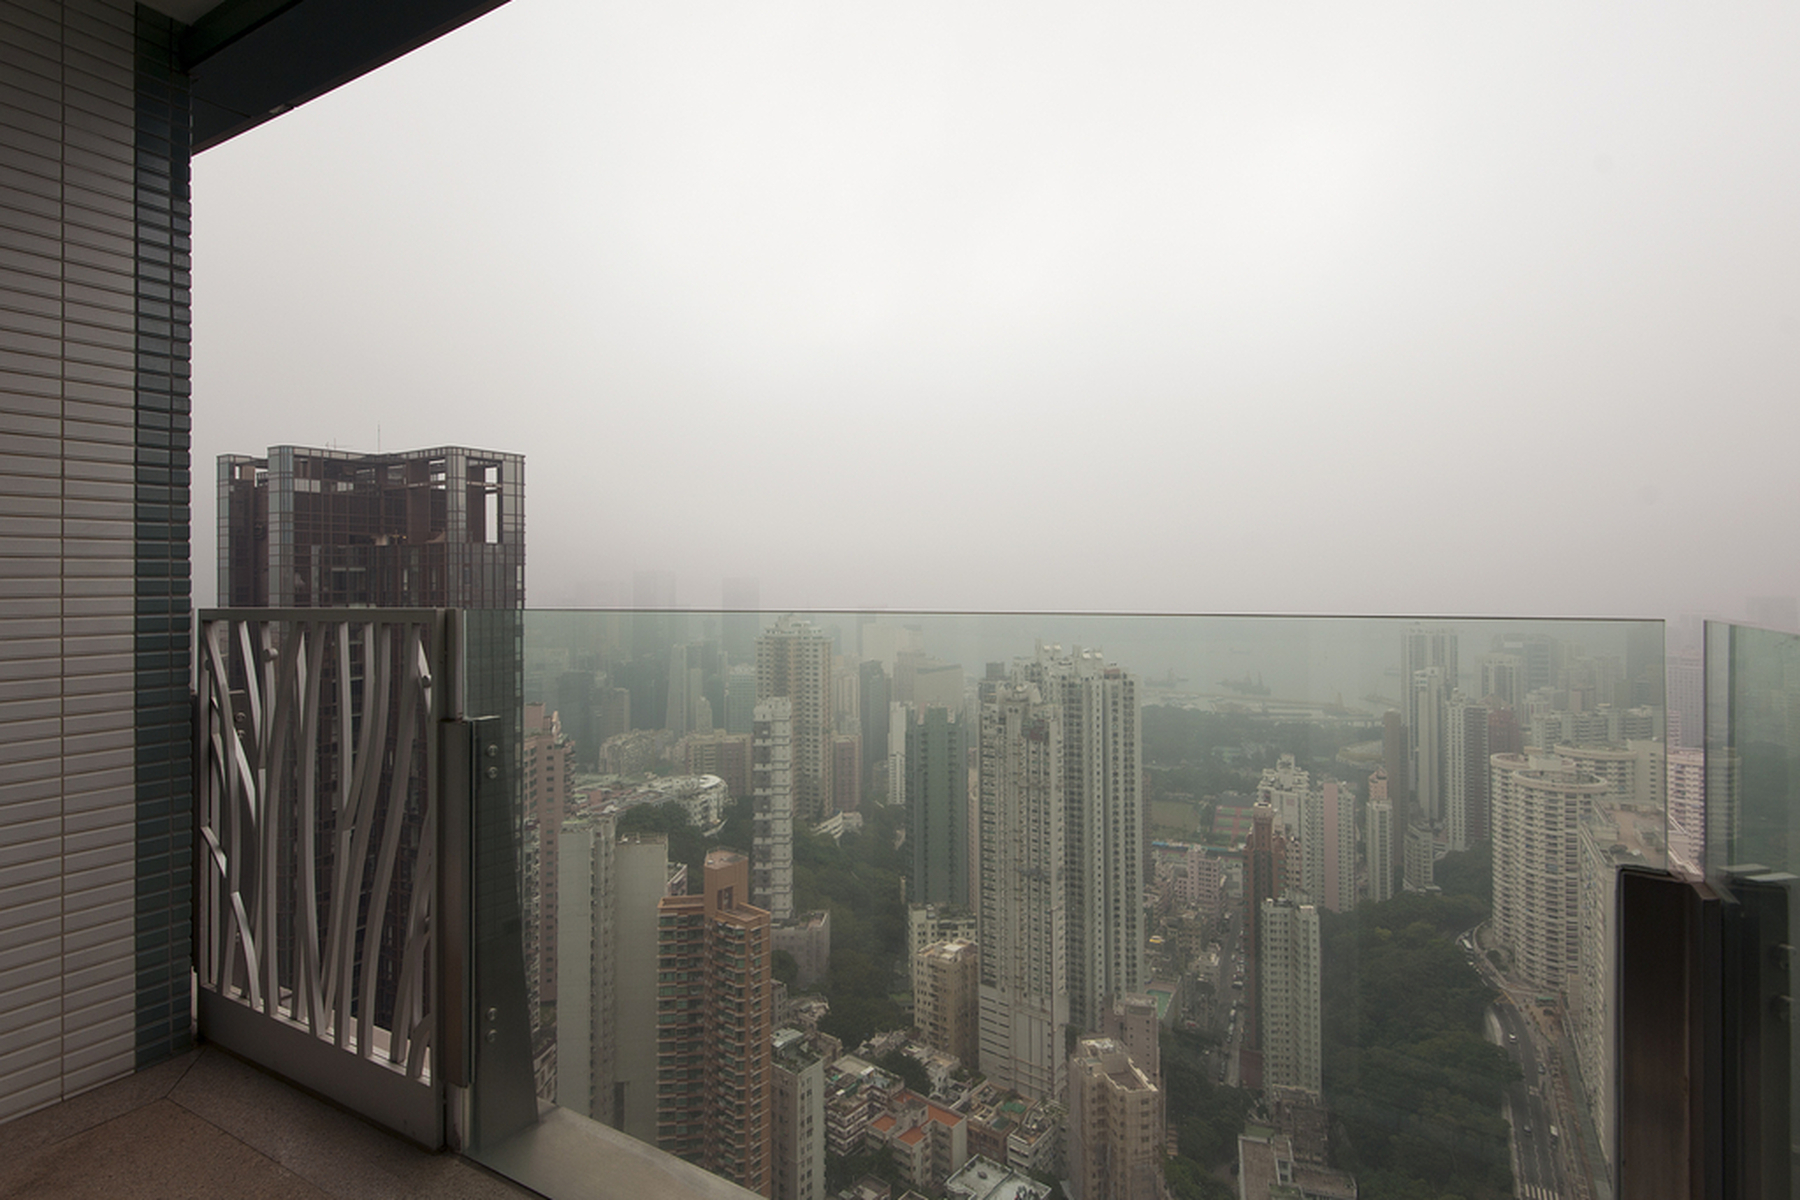 Apartment for Sale at The Legend - Block 01 Other Hong Kong, Hong Kong